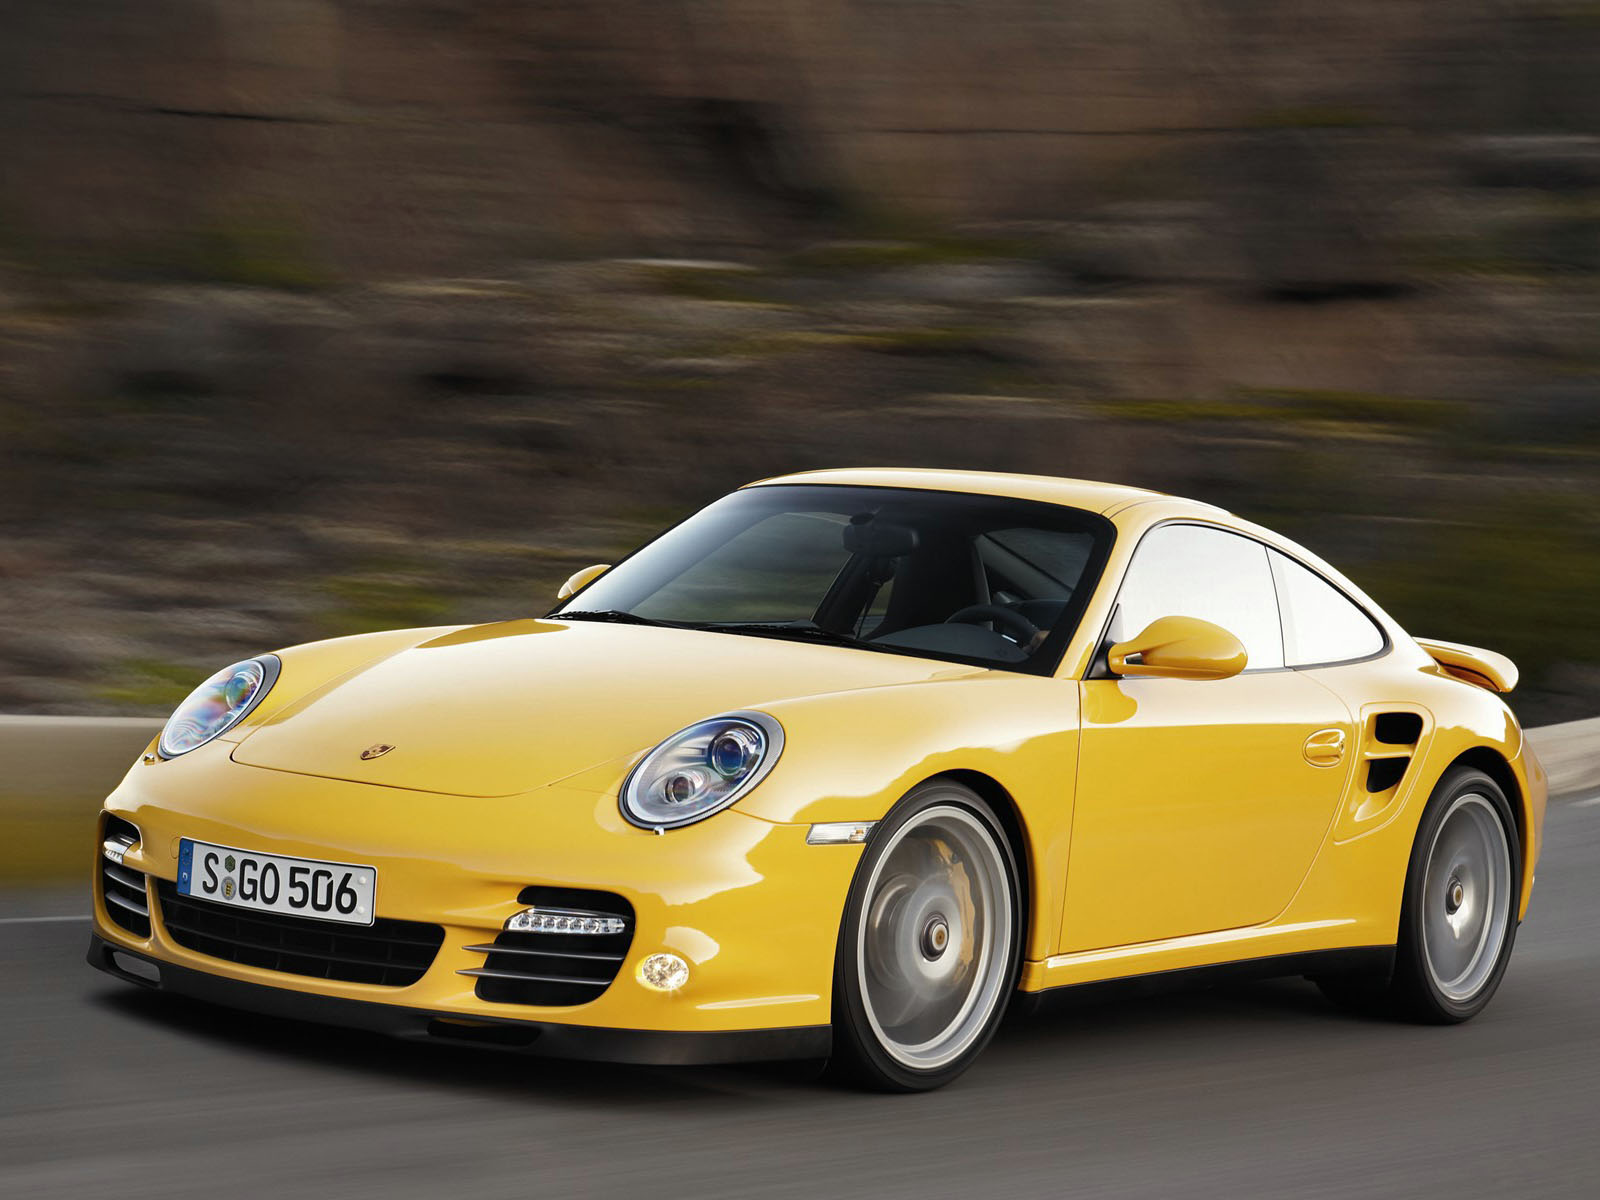 Automotivegeneral Yellow Porsche 911 Turbo S Wallpapers